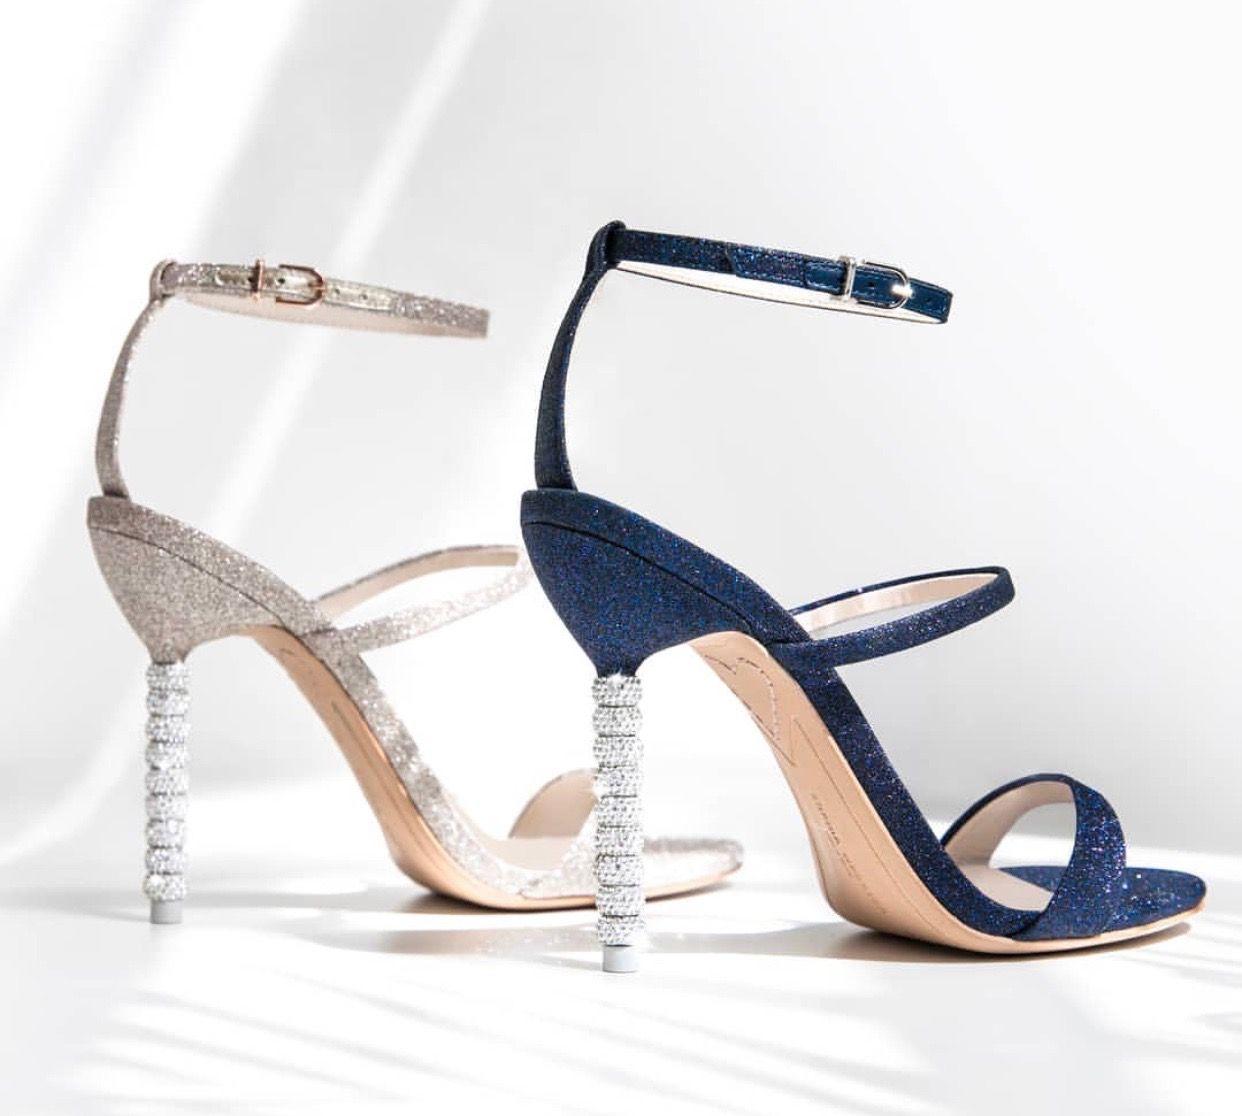 Sophia Webster Stiletto 2019 #shoes